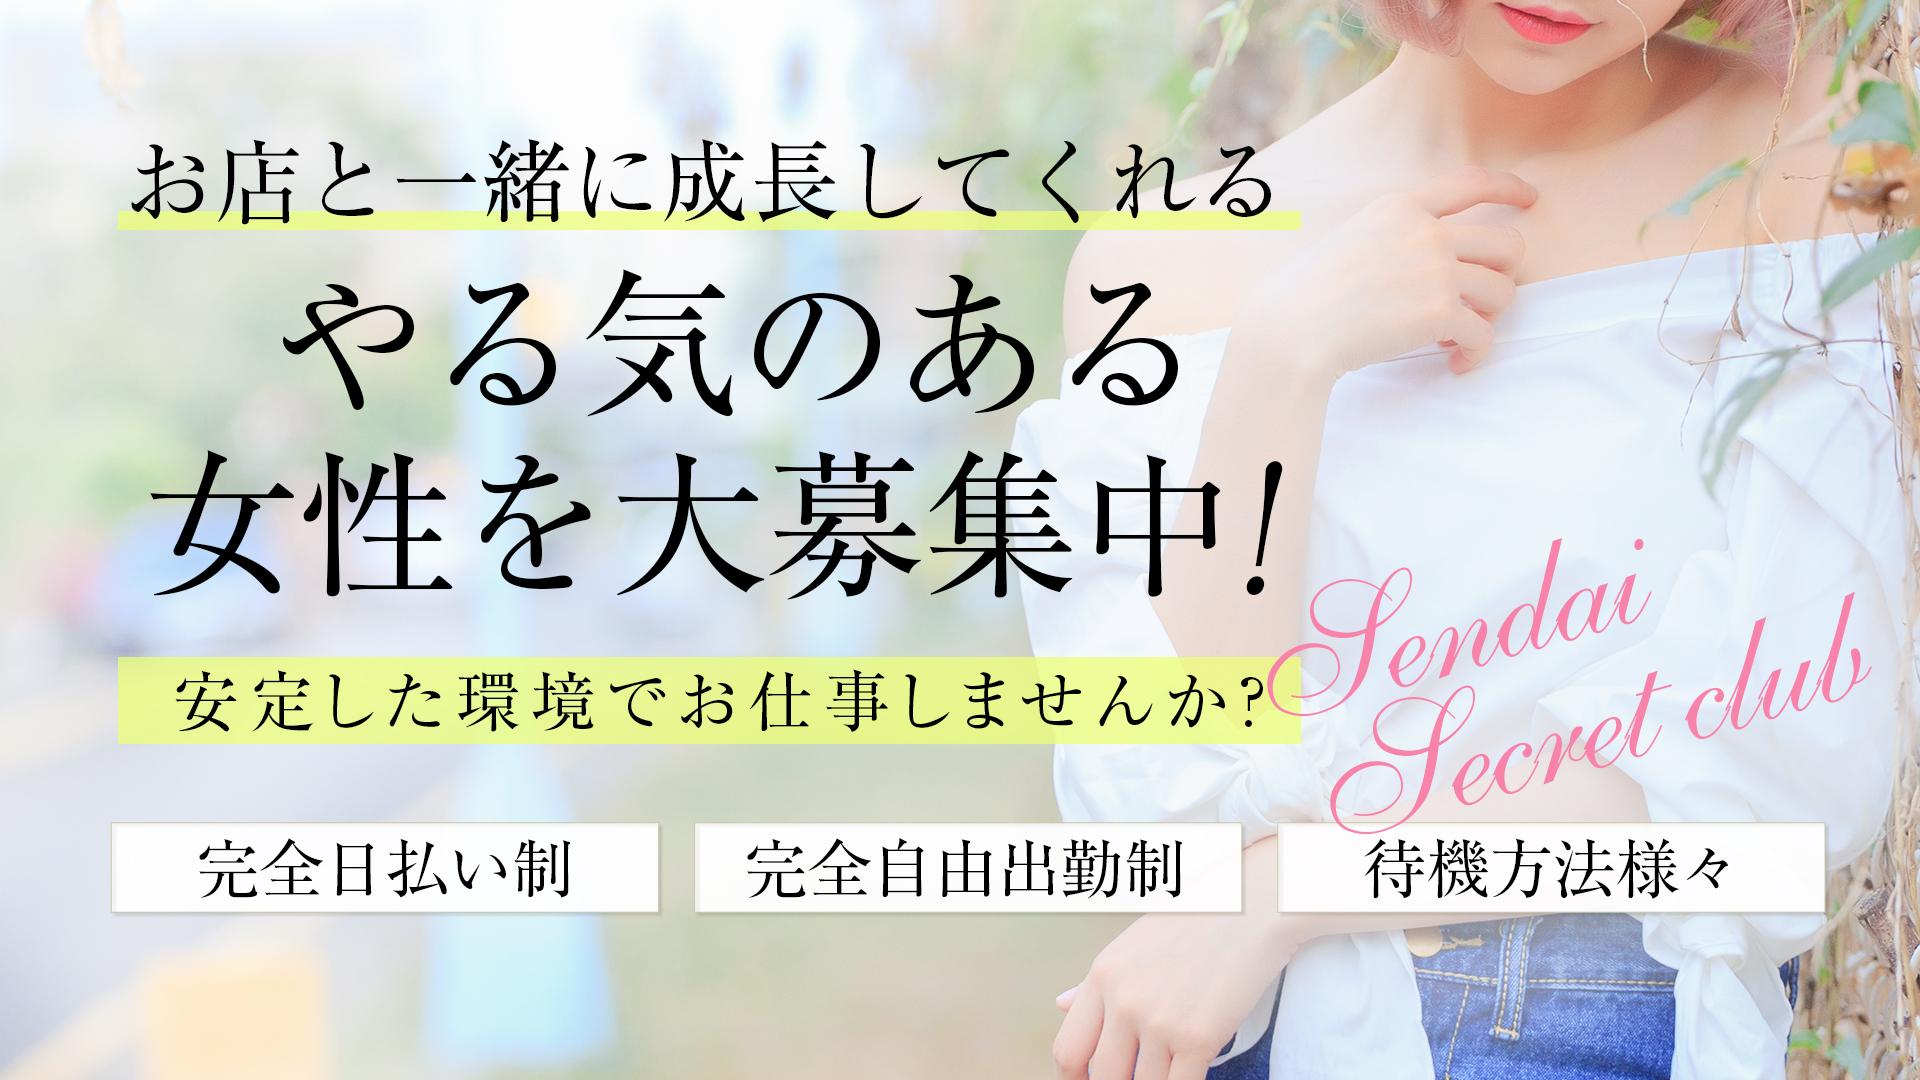 仙台秘密倶楽部の求人画像